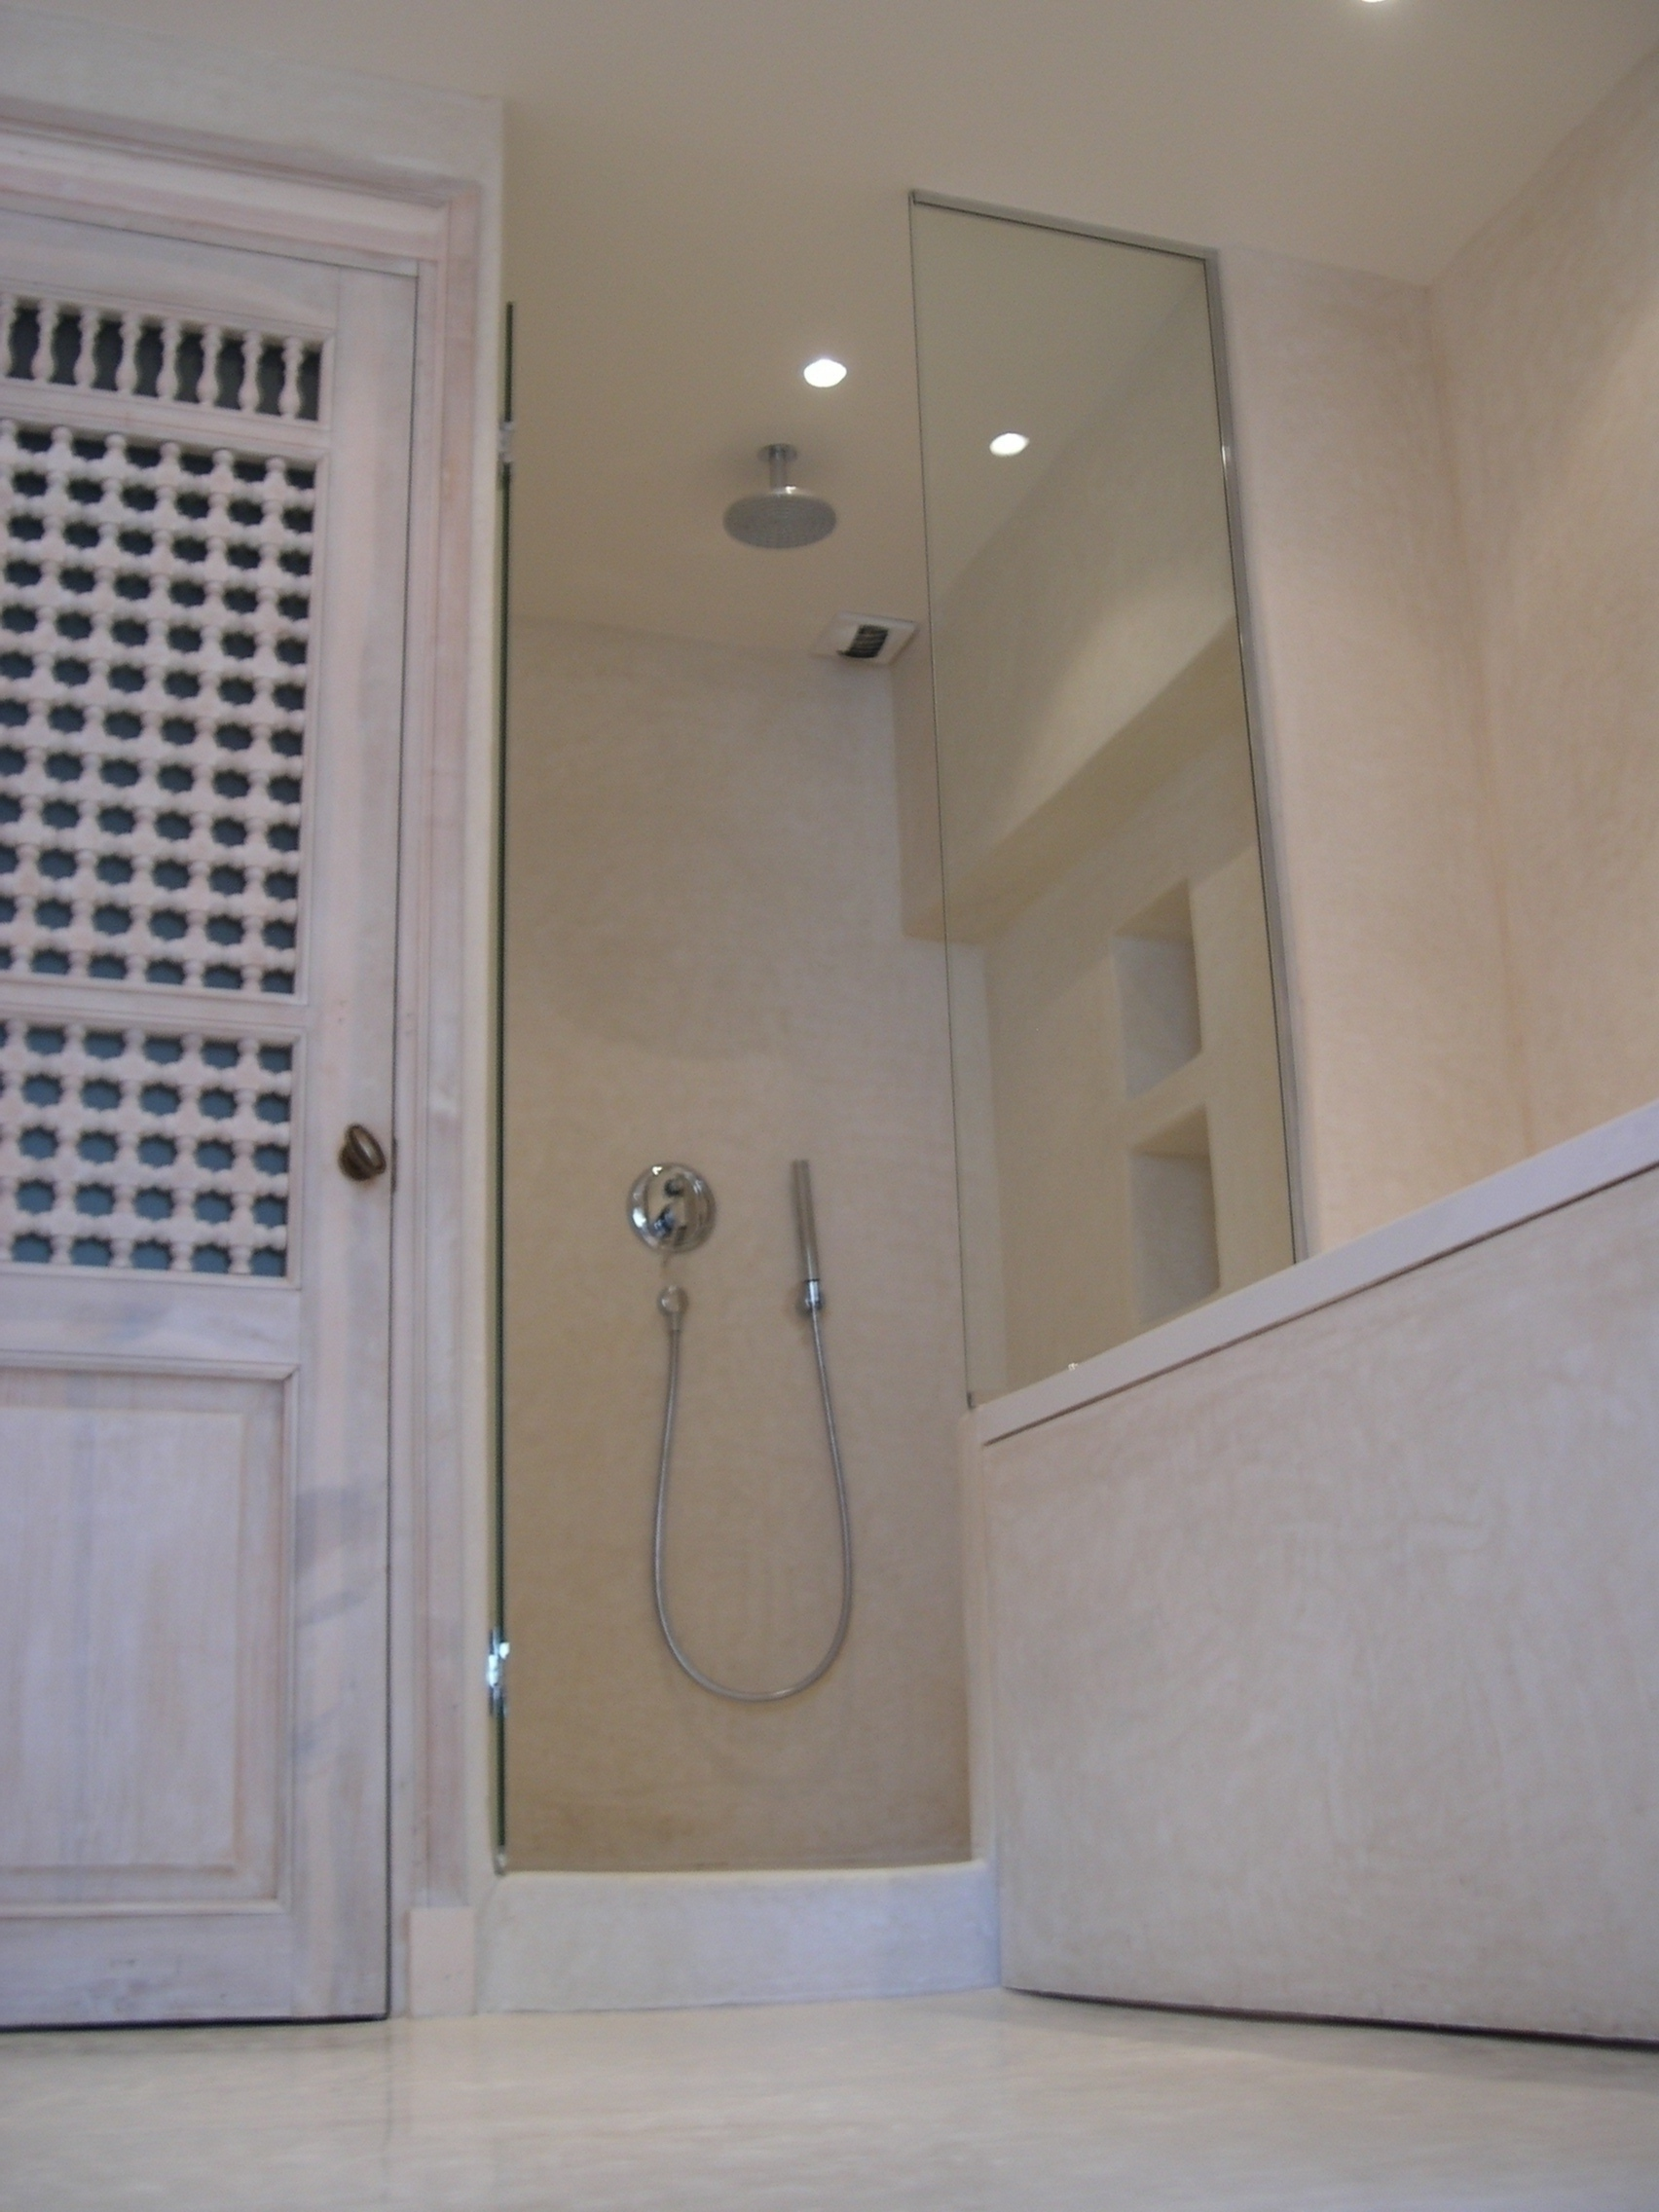 tadelakt de marrakech lahouari tahiri artisan salle de bain douche sol en tadelakt nature. Black Bedroom Furniture Sets. Home Design Ideas